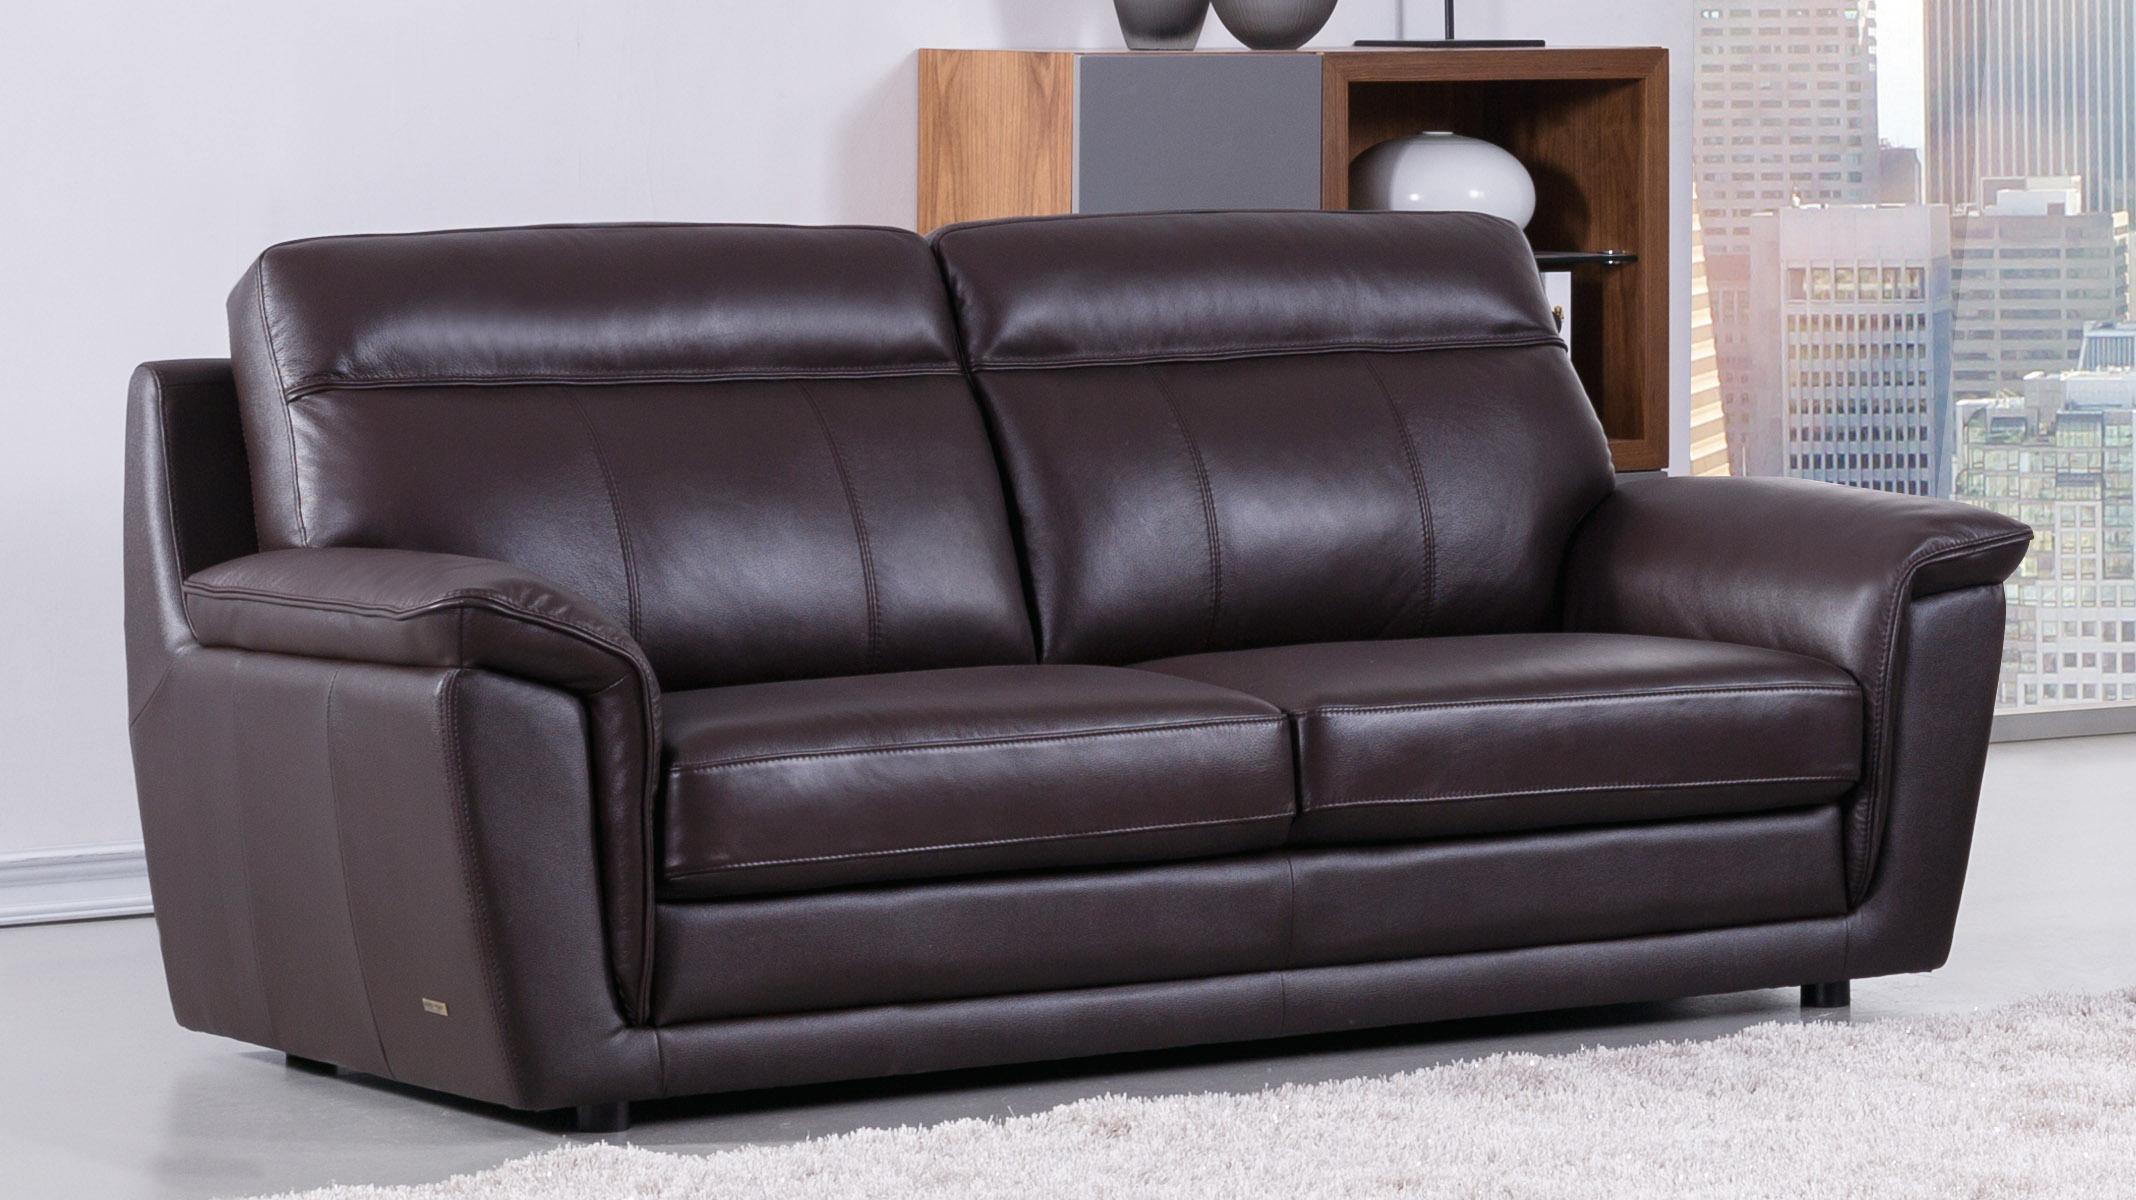 classic italian leather sofa white cleaners elegant set raleigh north